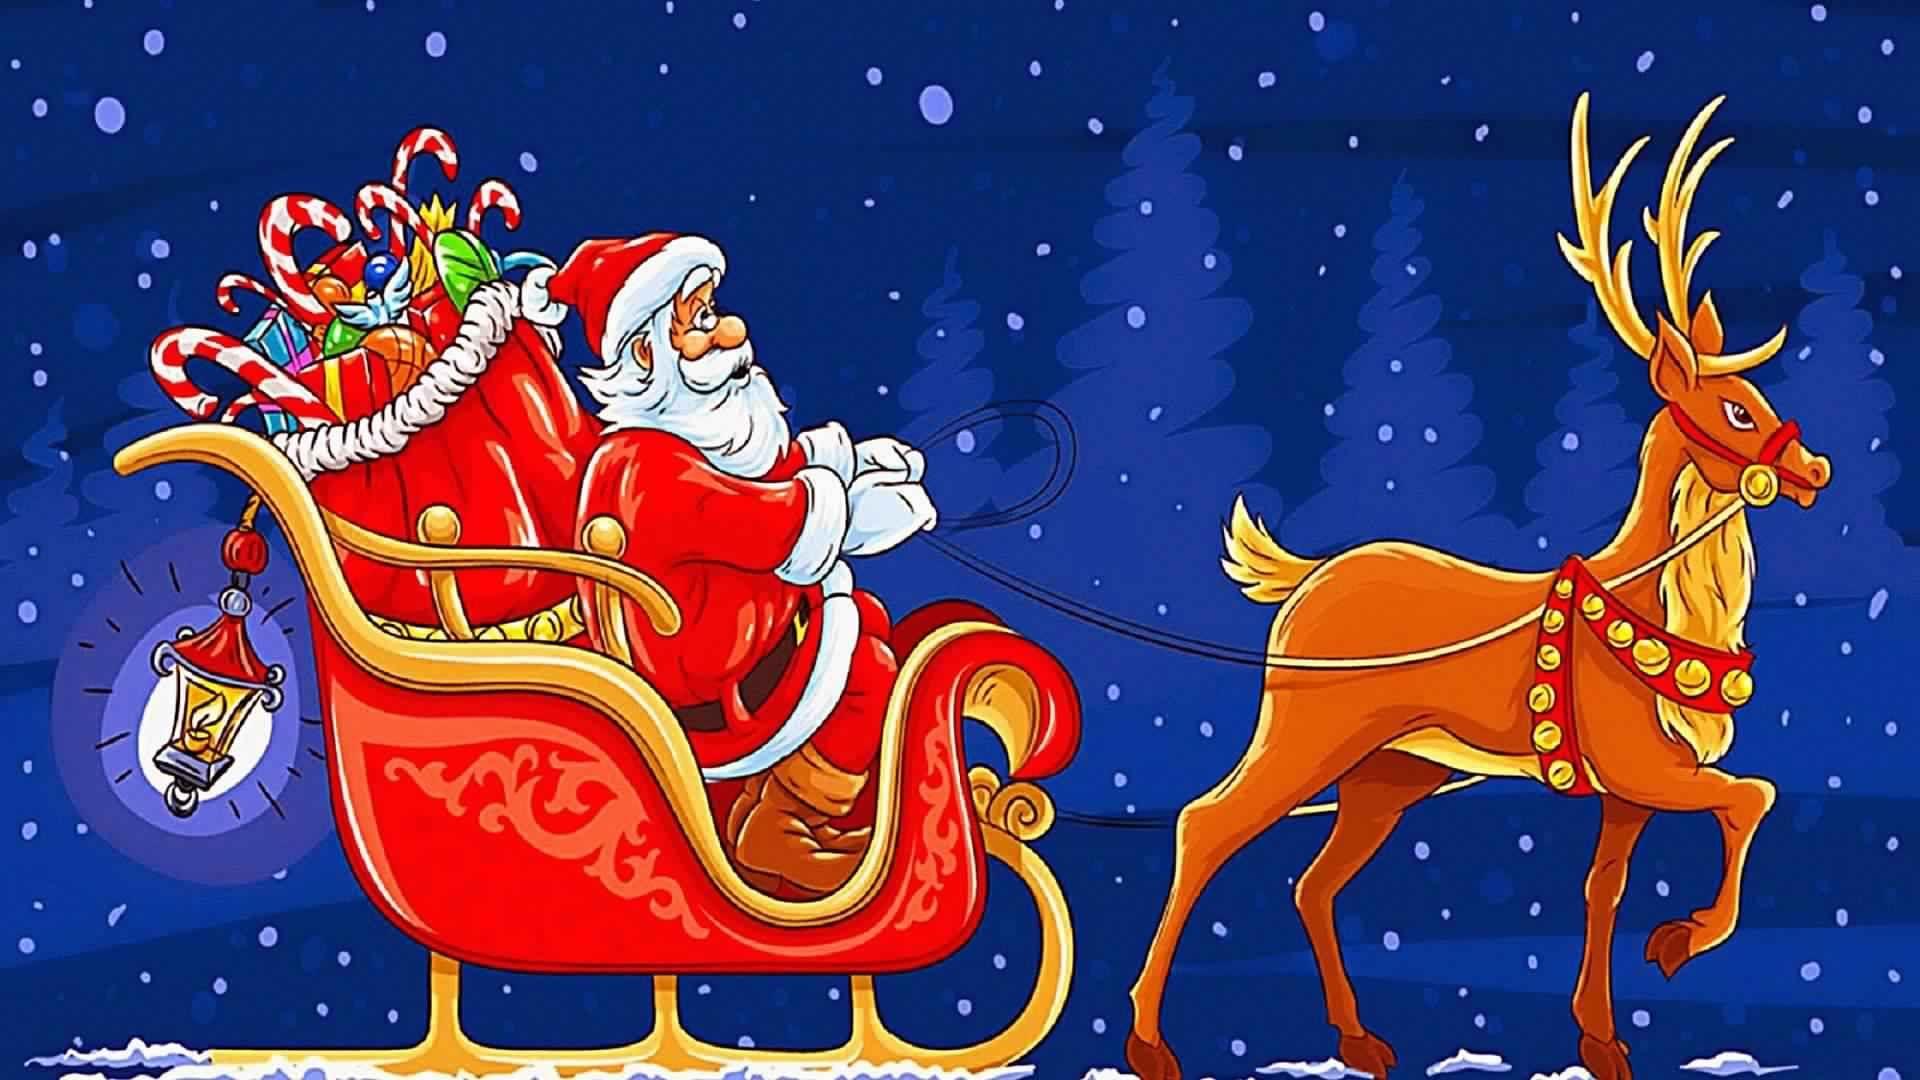 Christmas Sleigh desktop wallpaper download